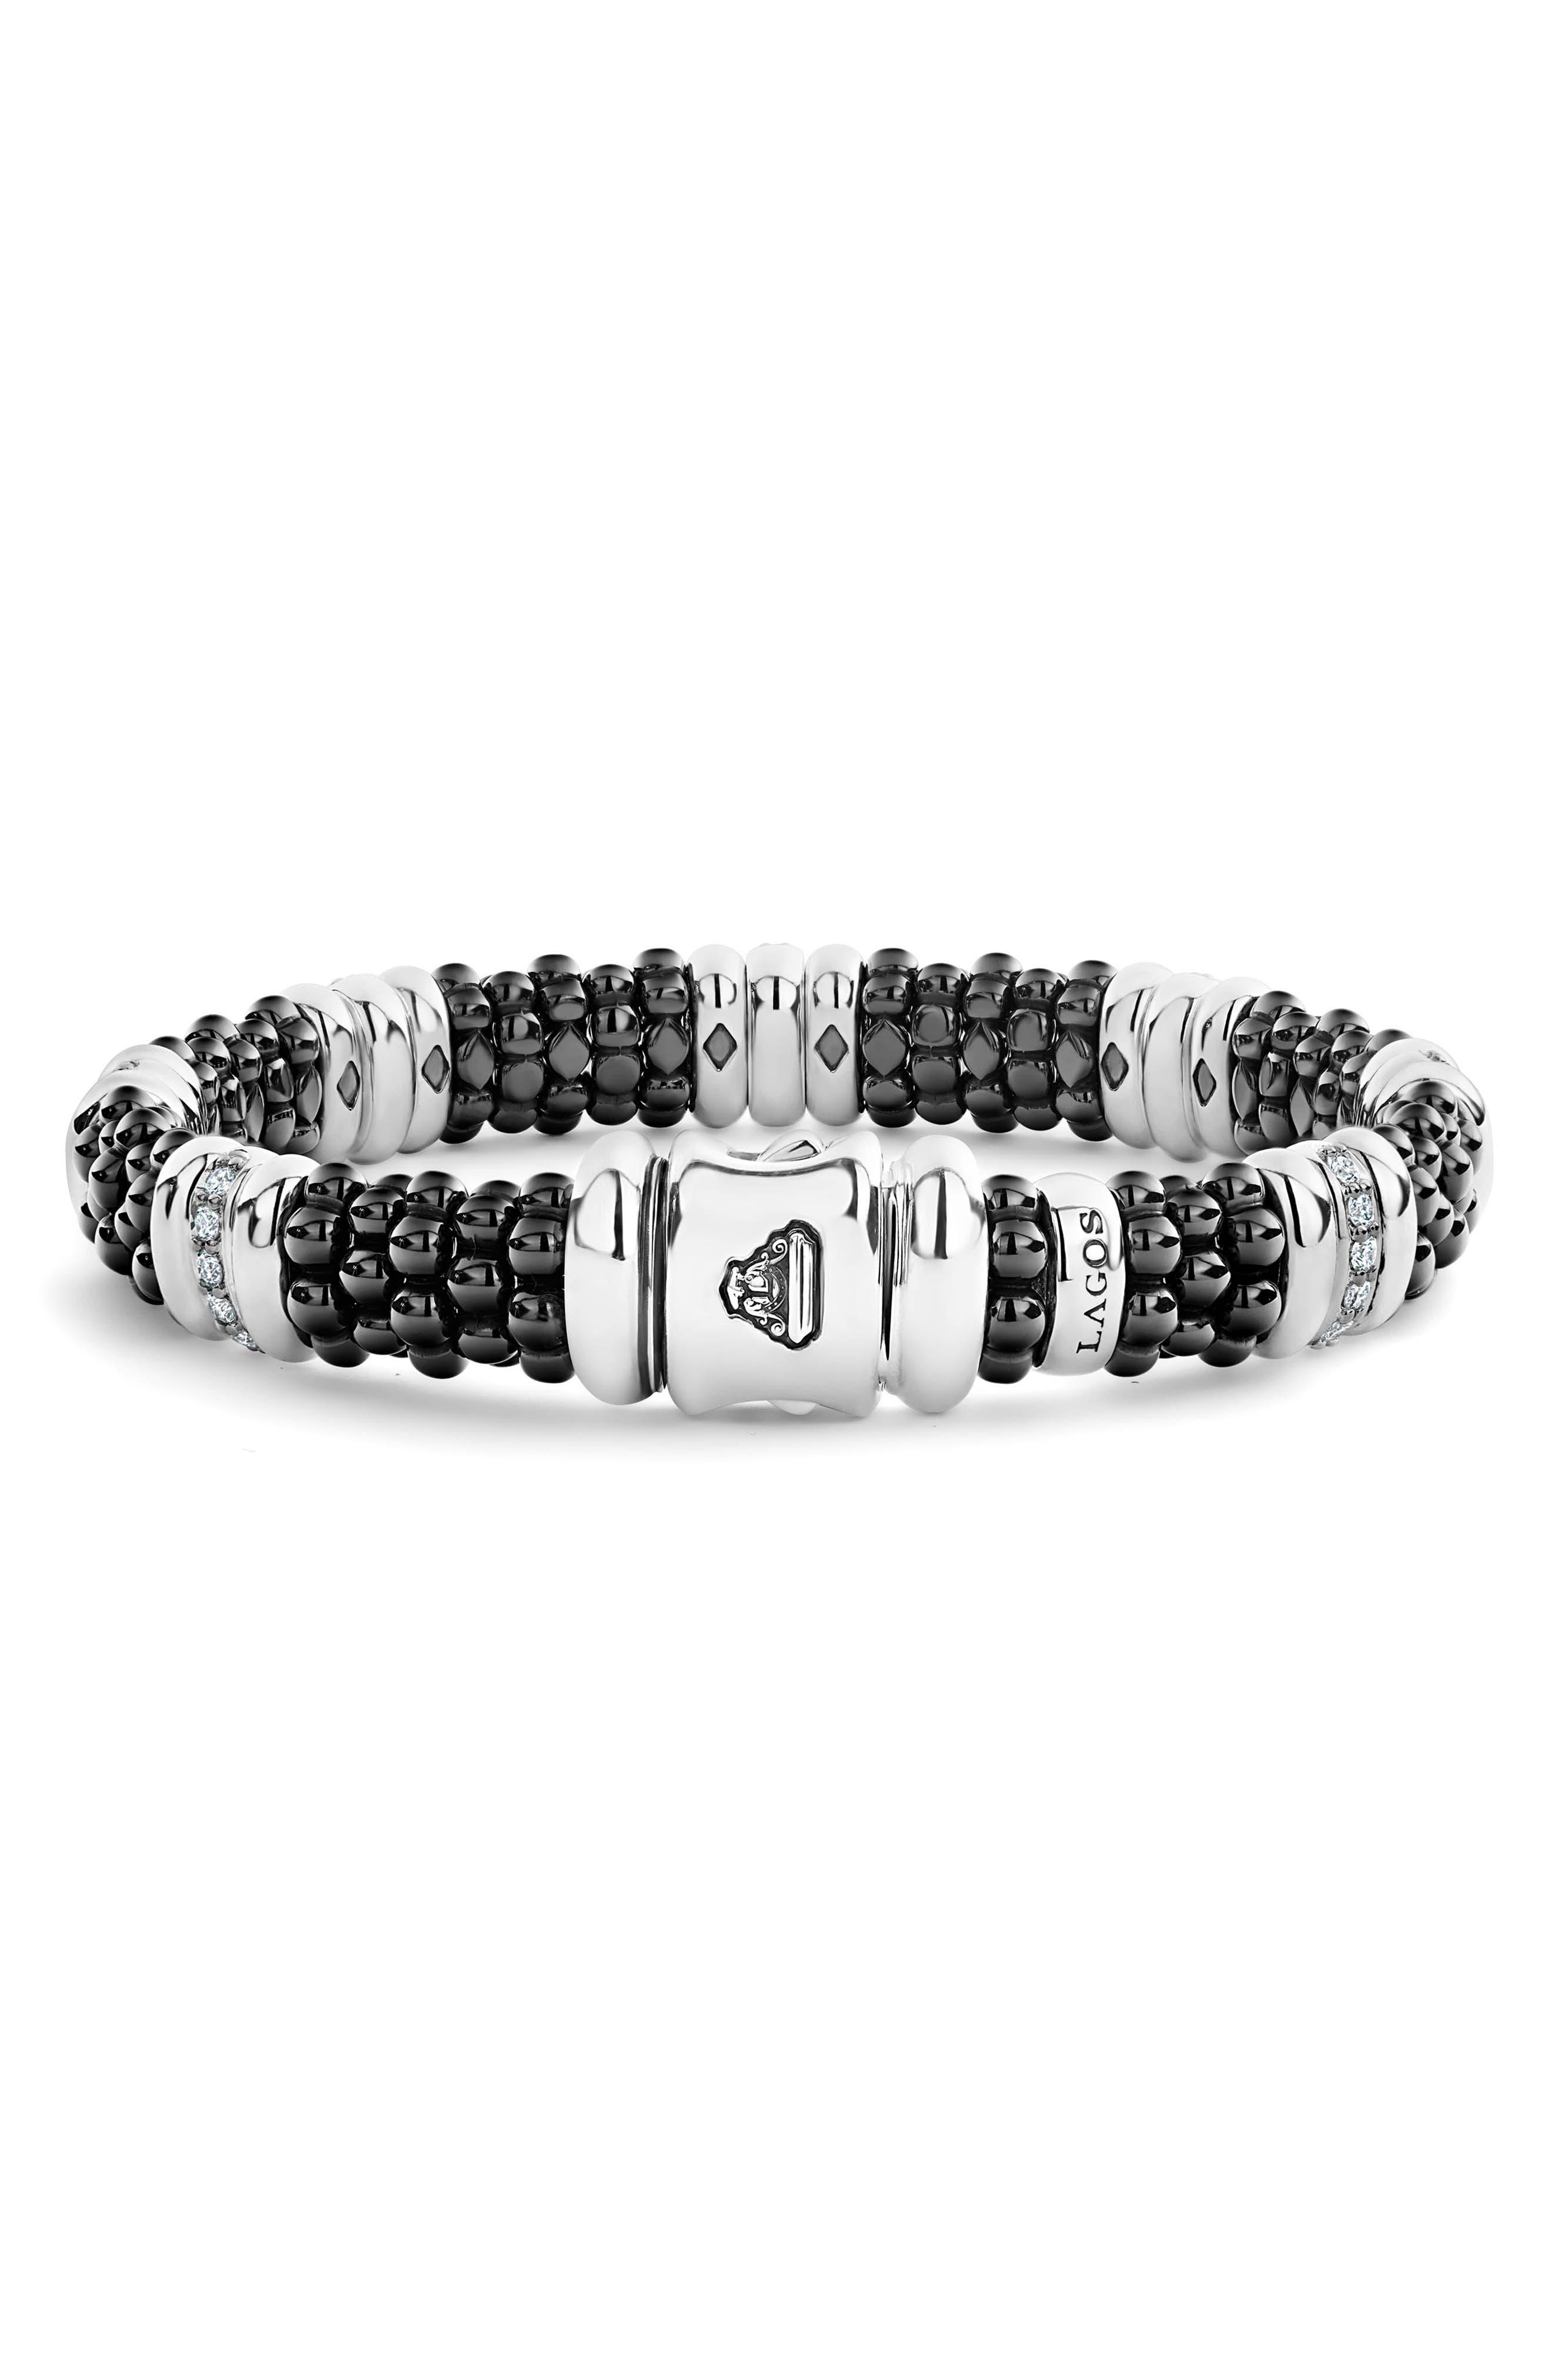 LAOGS Black Caviar Diamond 7-Link Bracelet,                             Alternate thumbnail 3, color,                             SILVER